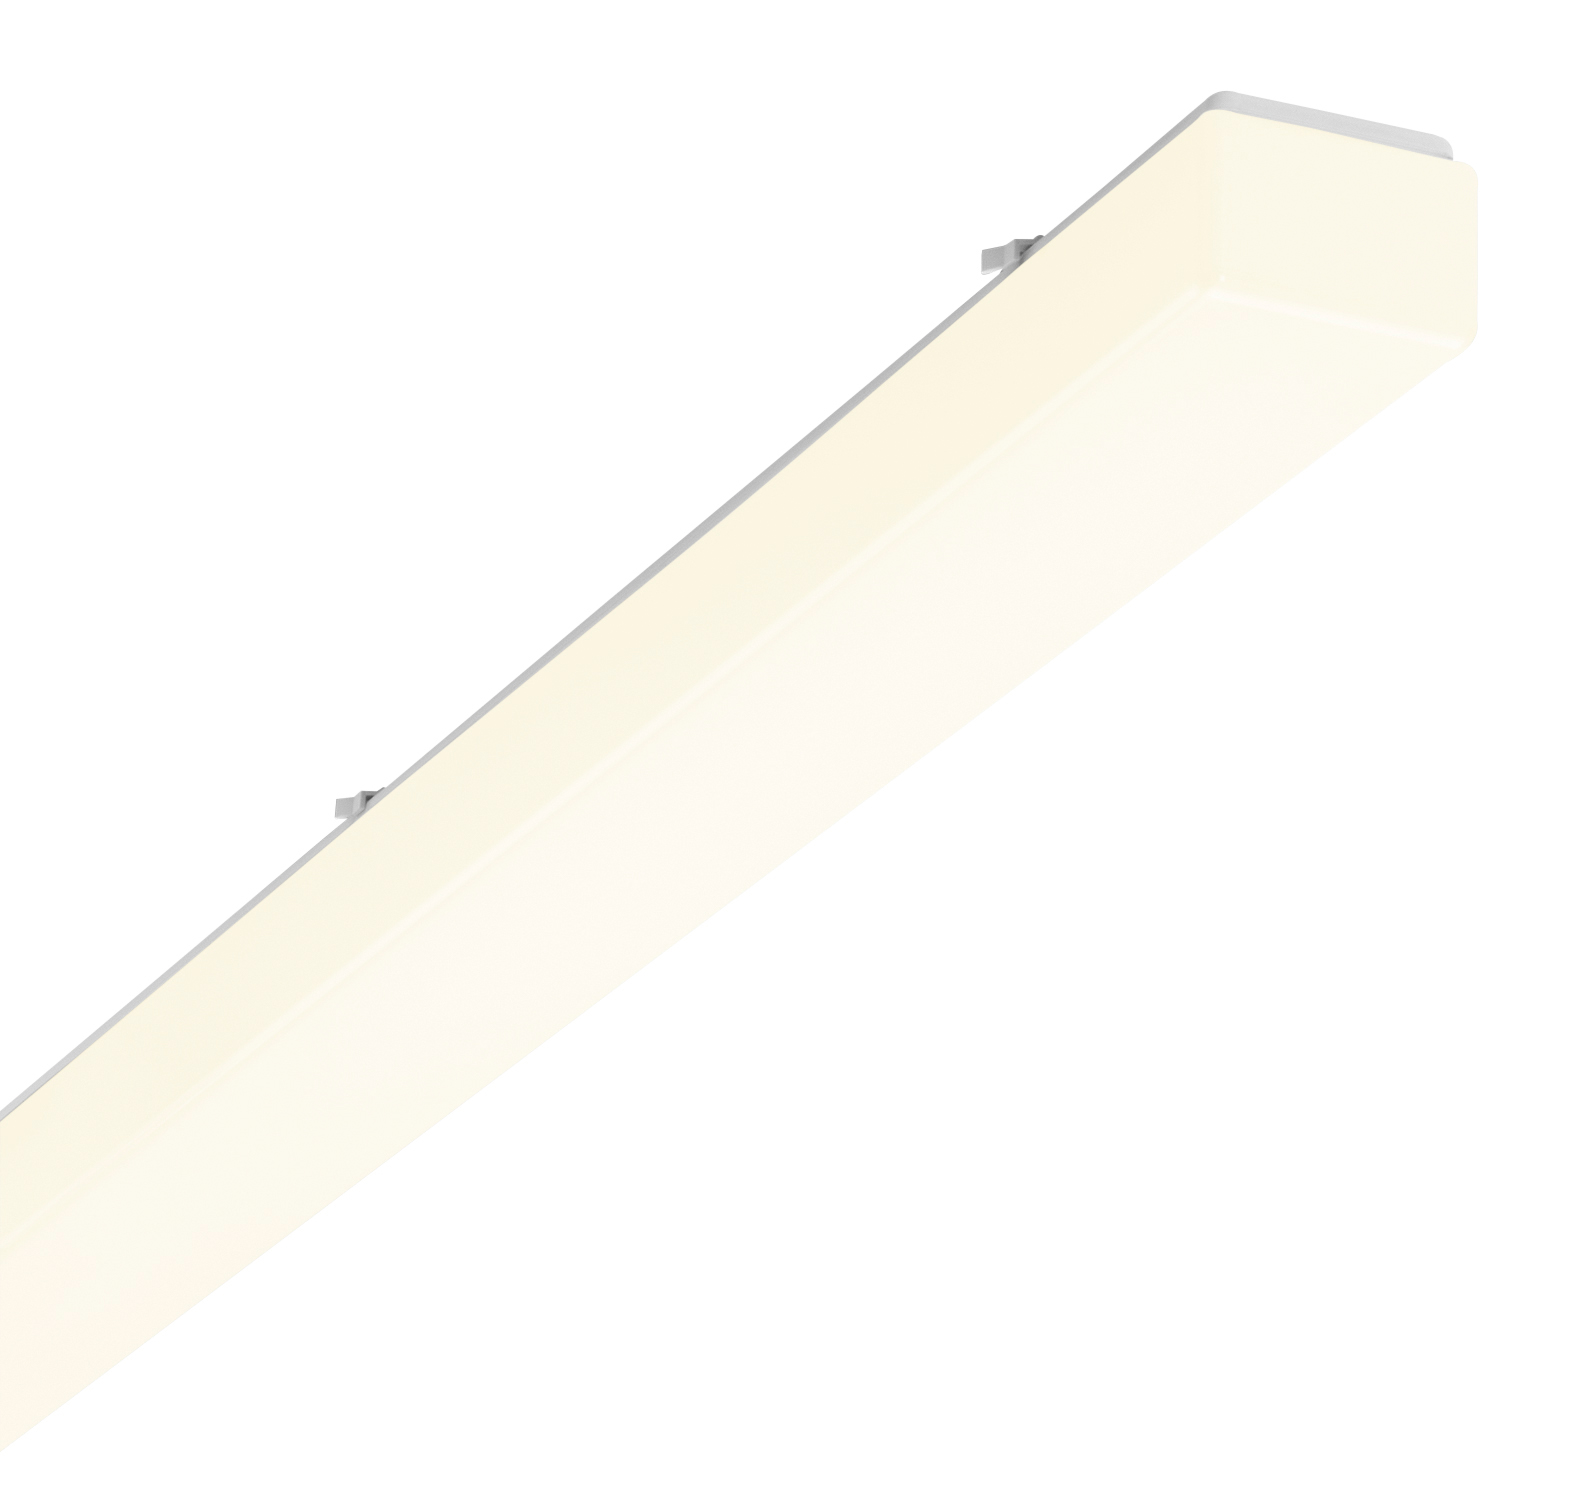 1 Stk AOT-O LED Wannenleuchte, 62W, 3000K, IP50, acryl, opal, Weiß LI70121962